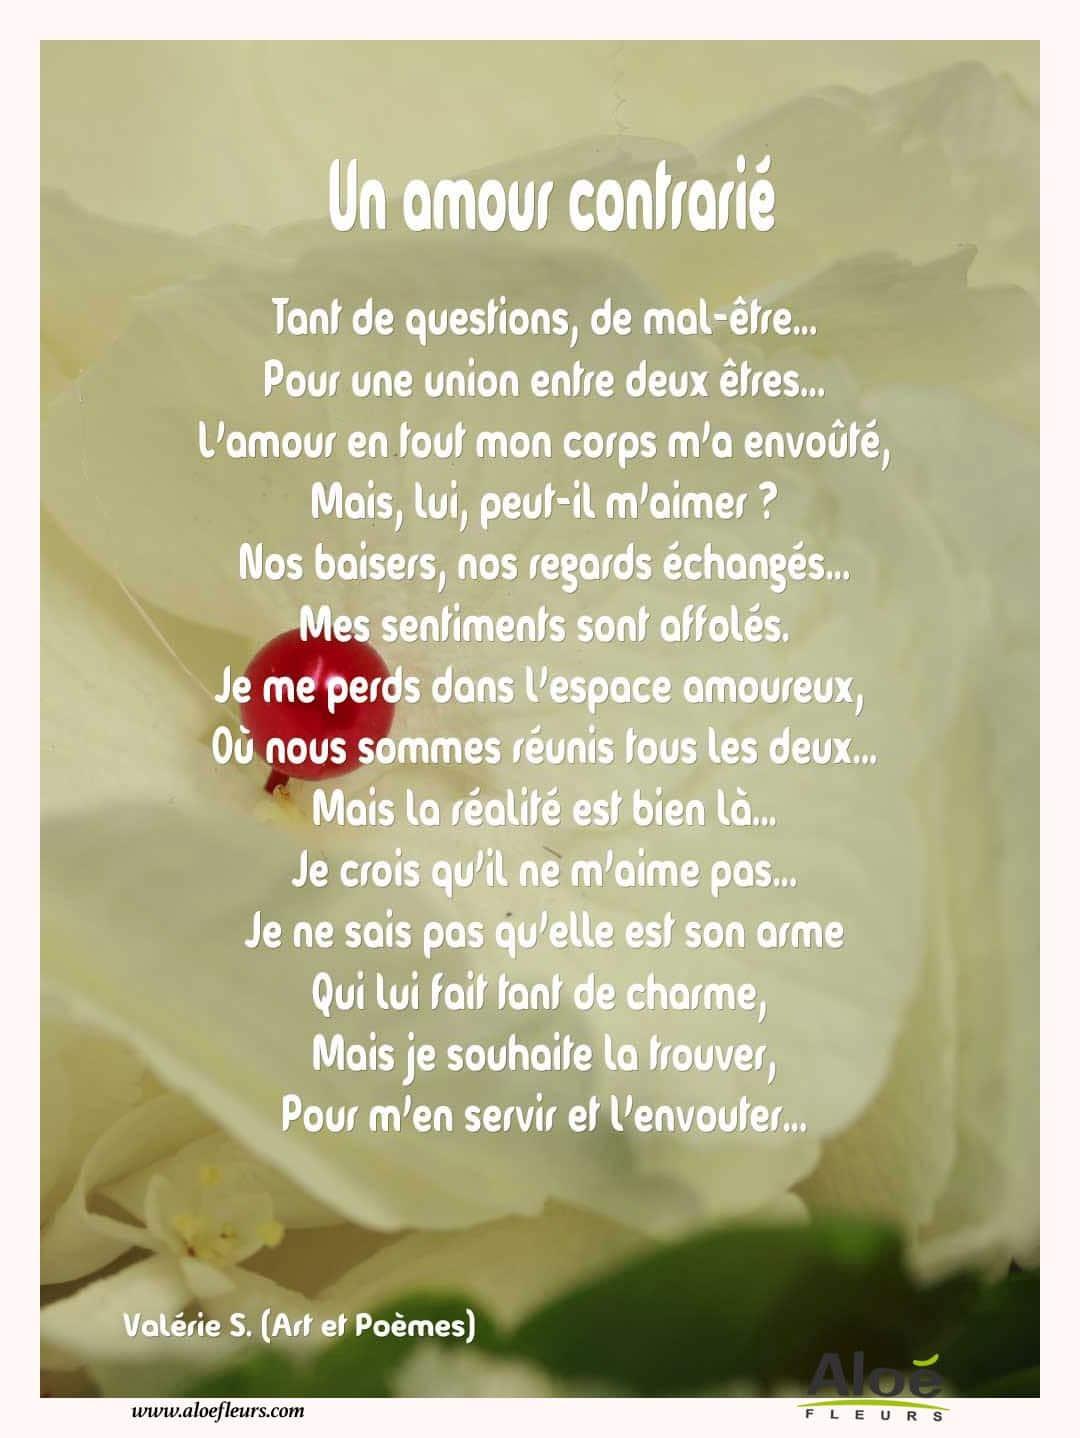 Poeme rencontre amoureuse internet